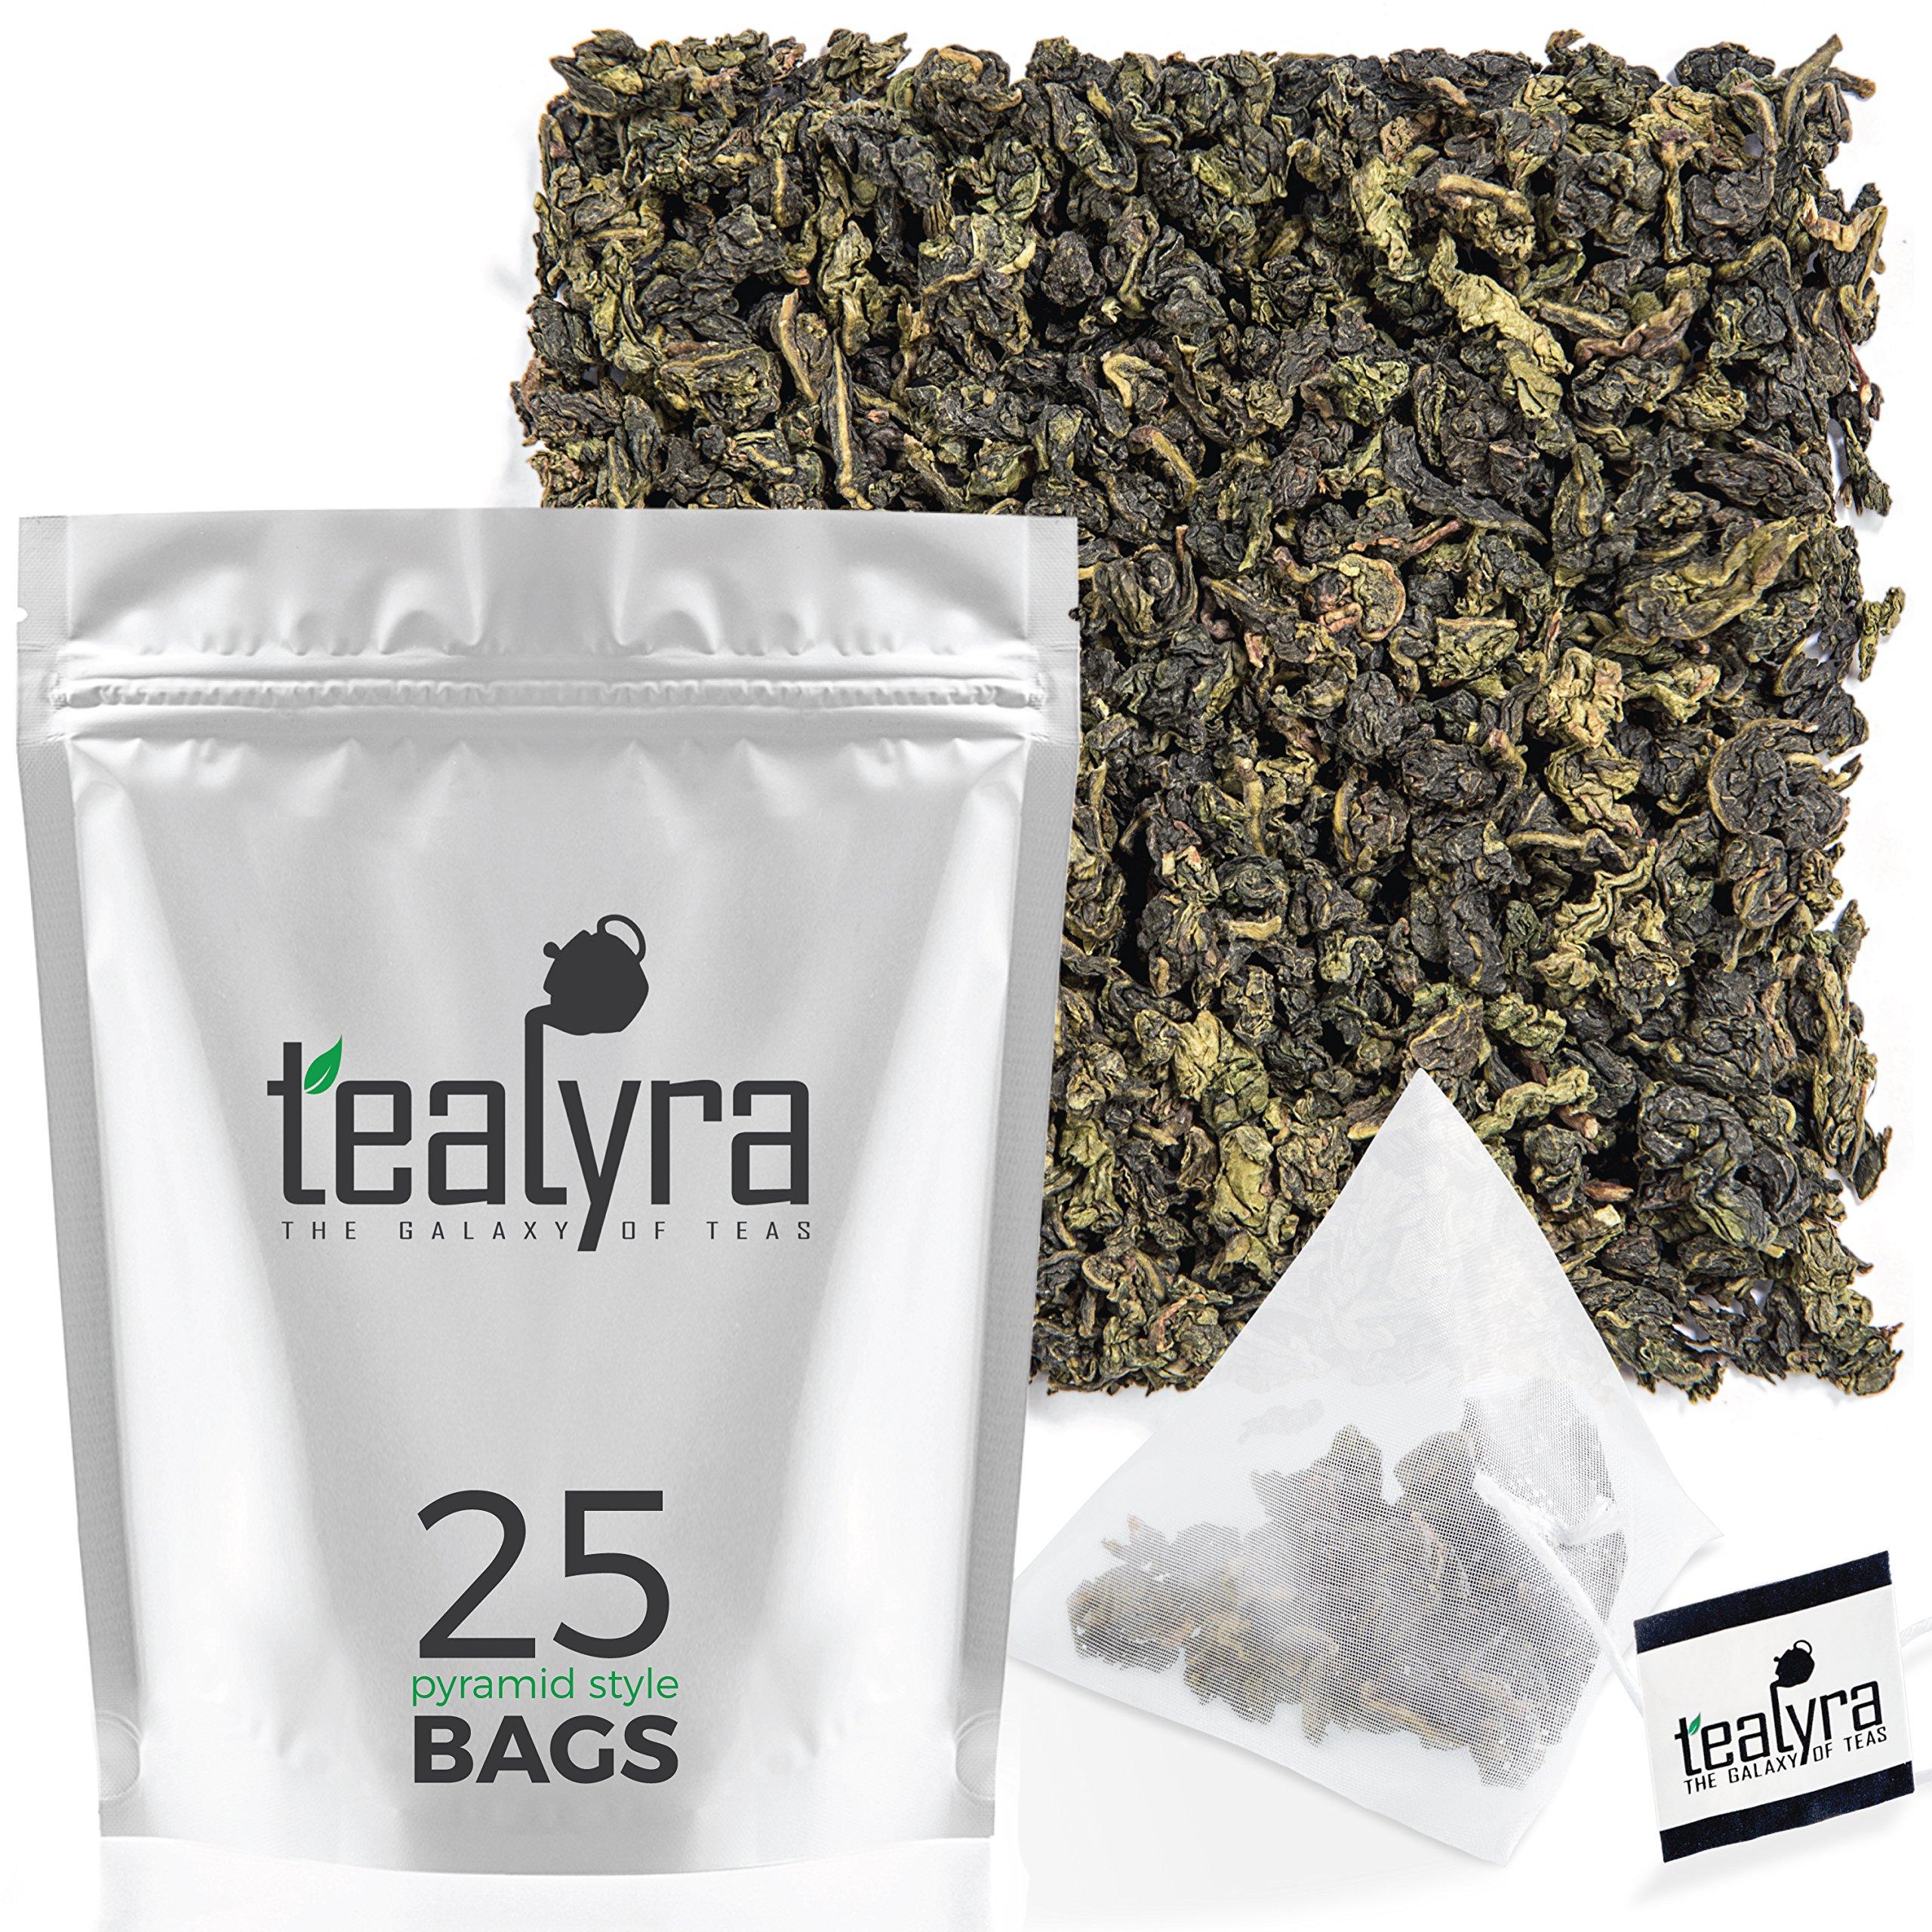 Tealyra - Tie Guan Yin Oolong - 25 Tea Bags - Iron Goddess of Mercy Loose Leaf - Organically Grown - Pyramids Style Sachets